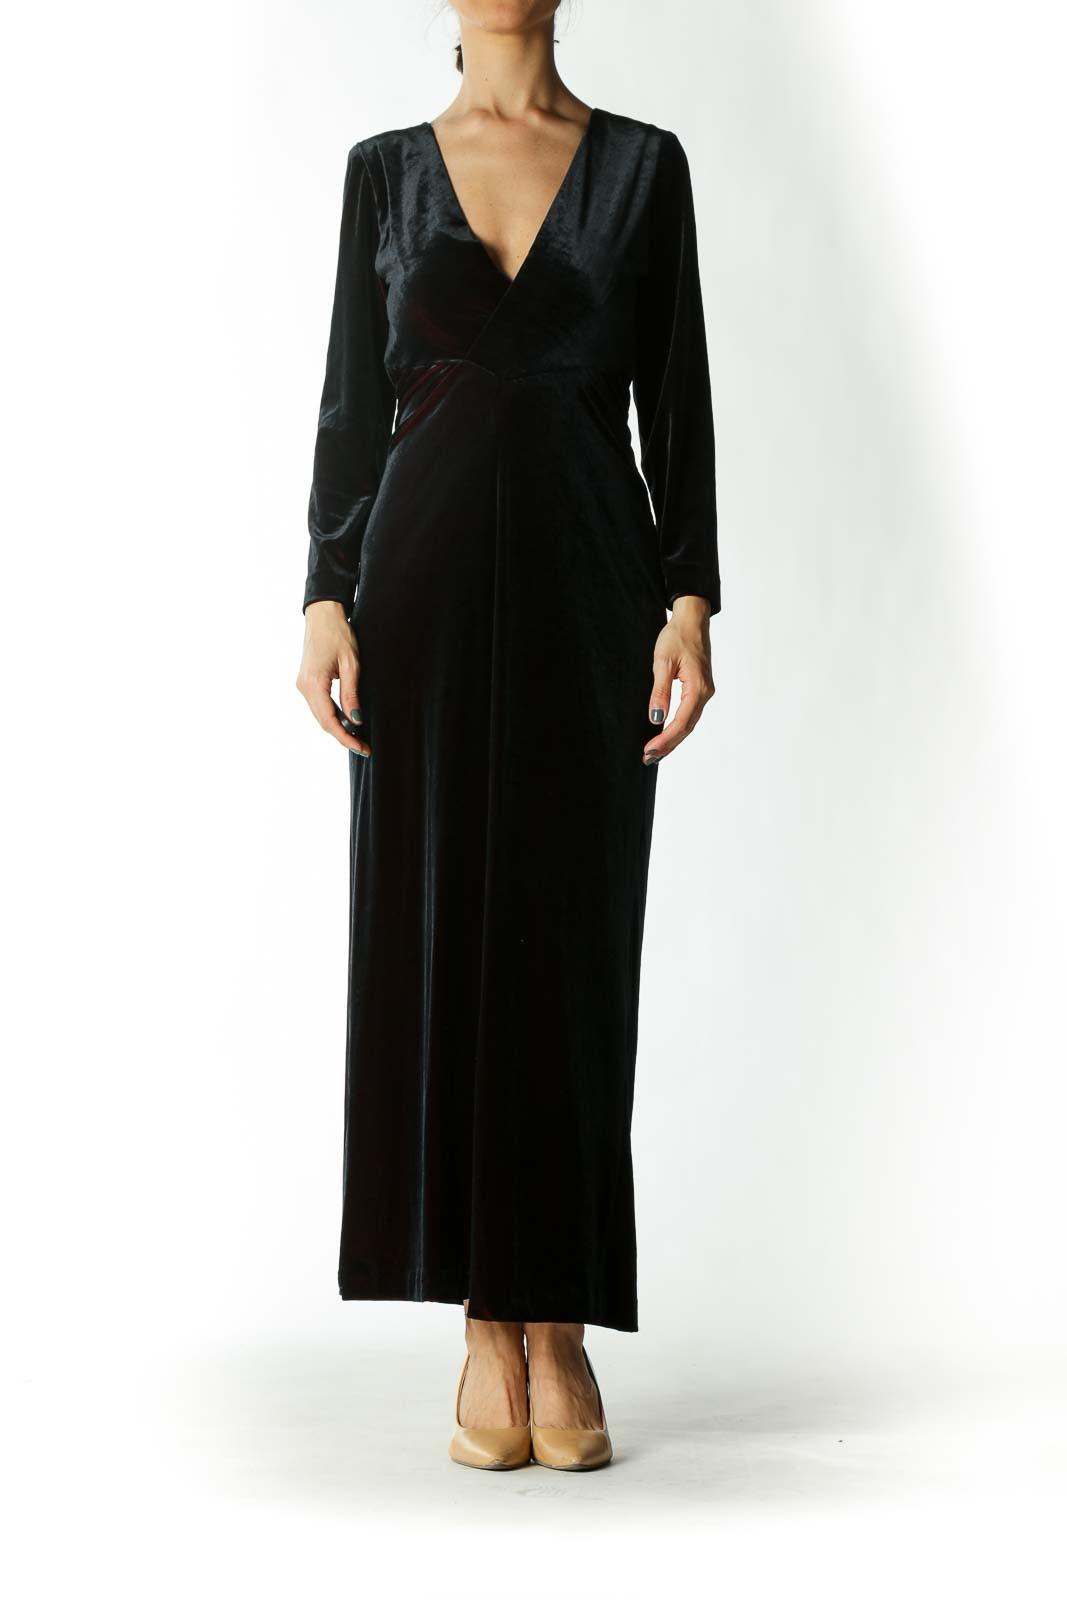 Black and Burgundy Evening Dress